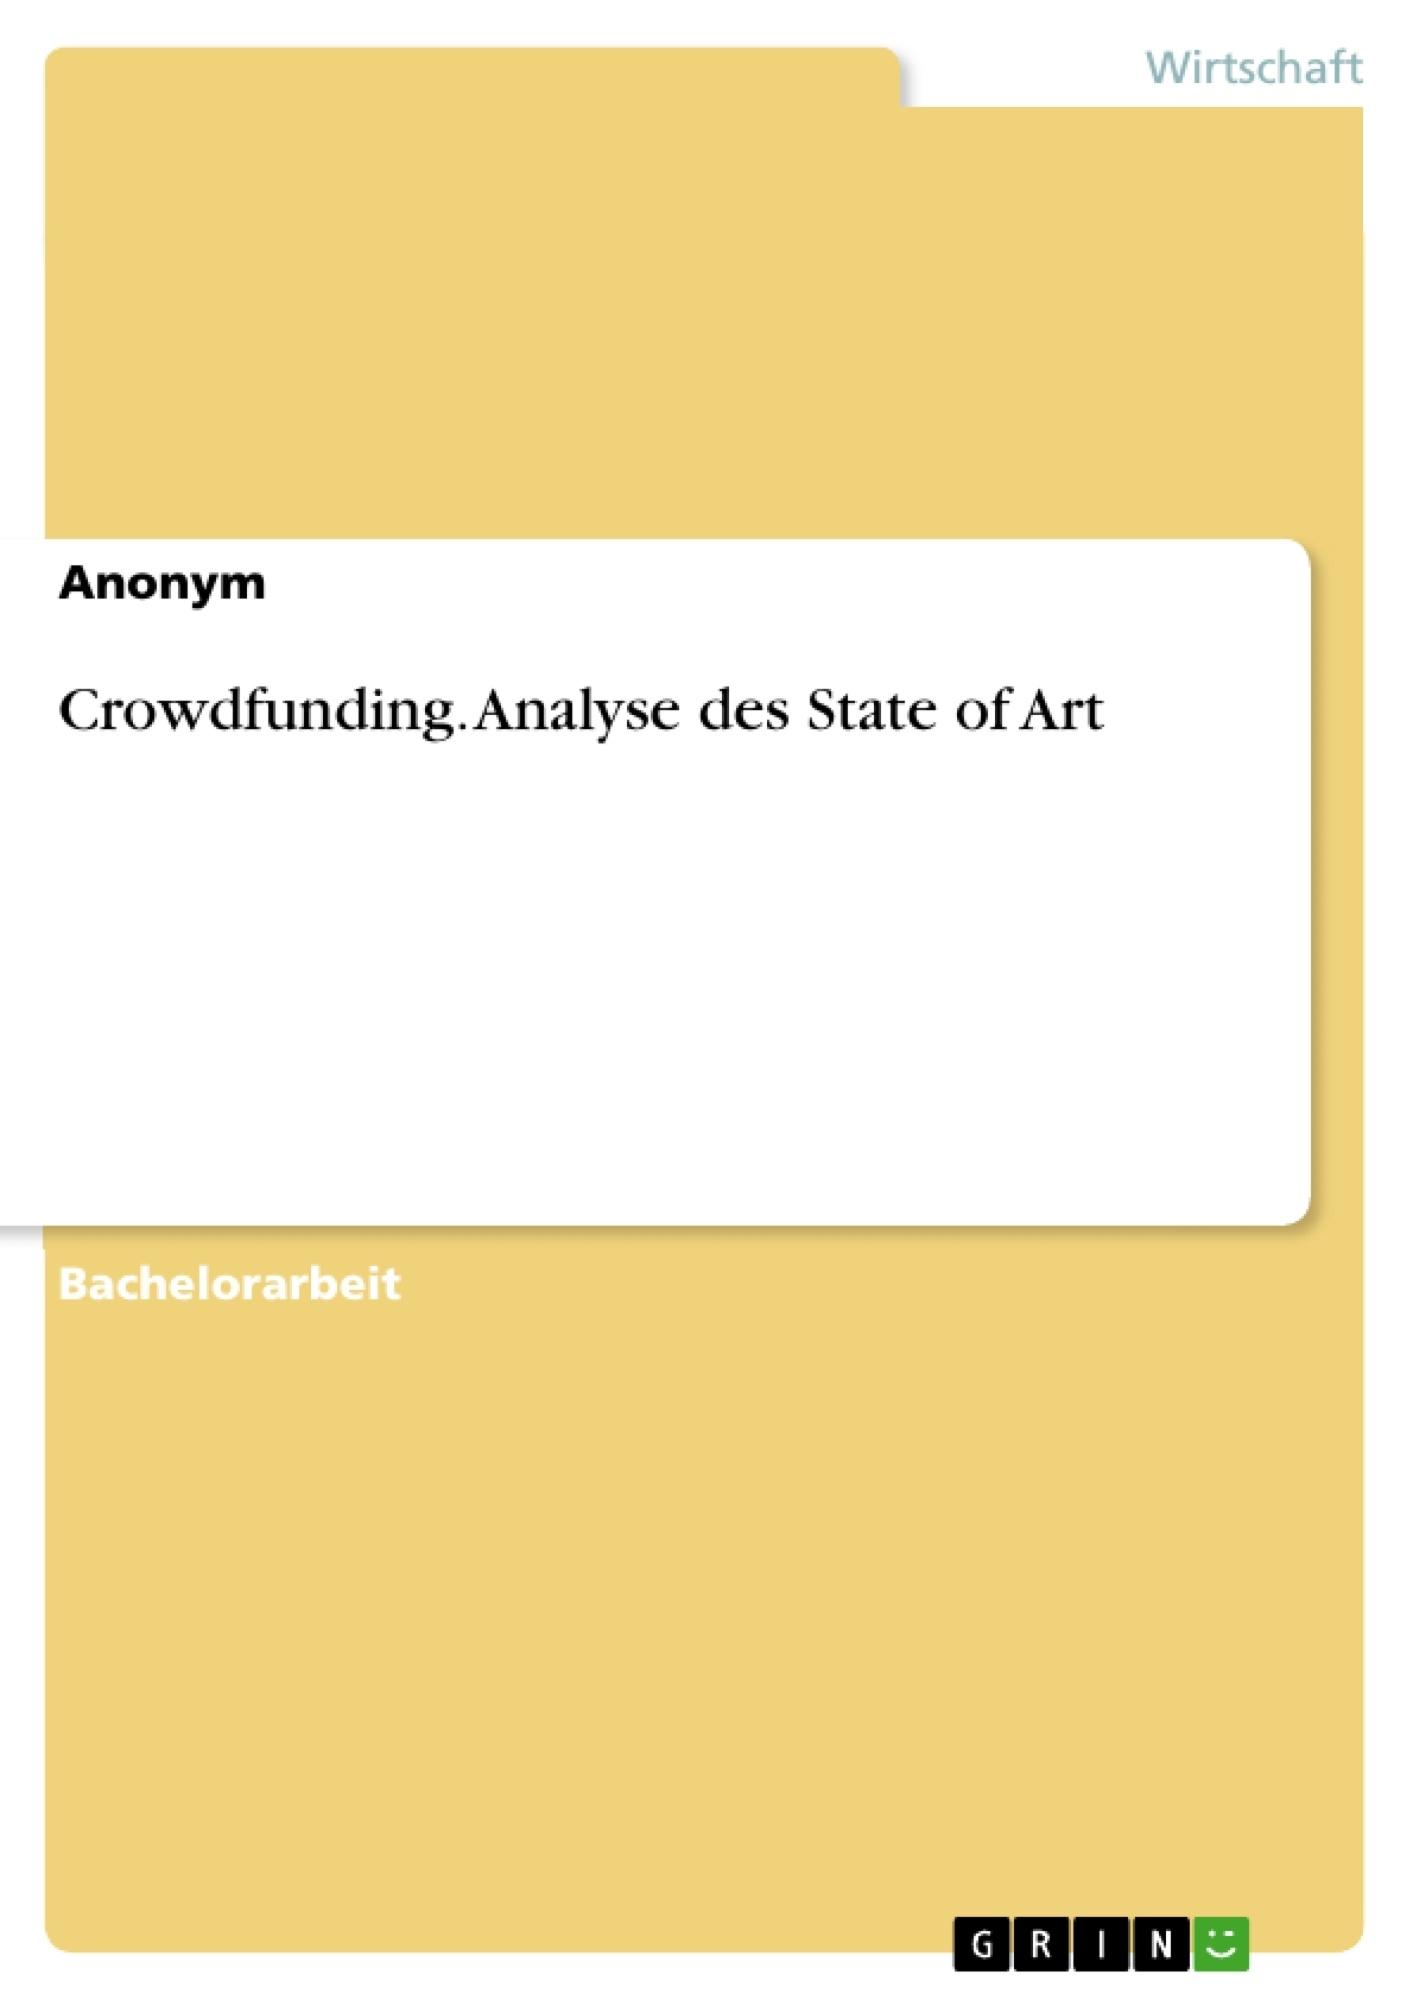 Titel: Crowdfunding. Analyse des State of Art